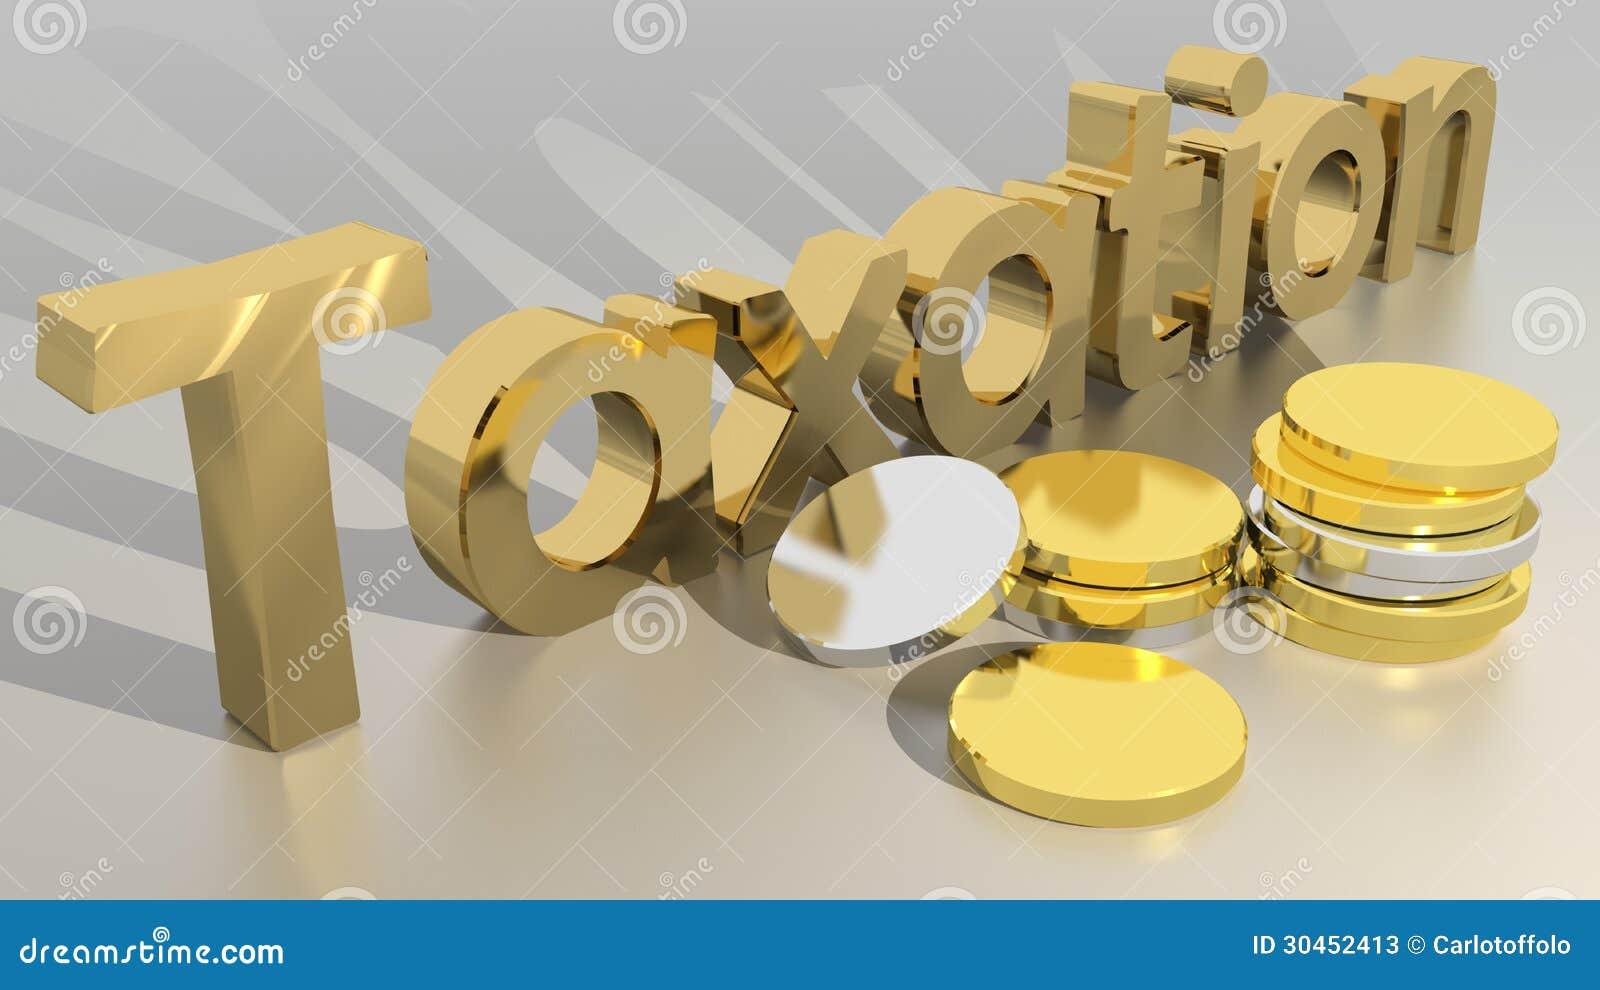 Taxation stock illustration. Illustration of revenue - 30452413